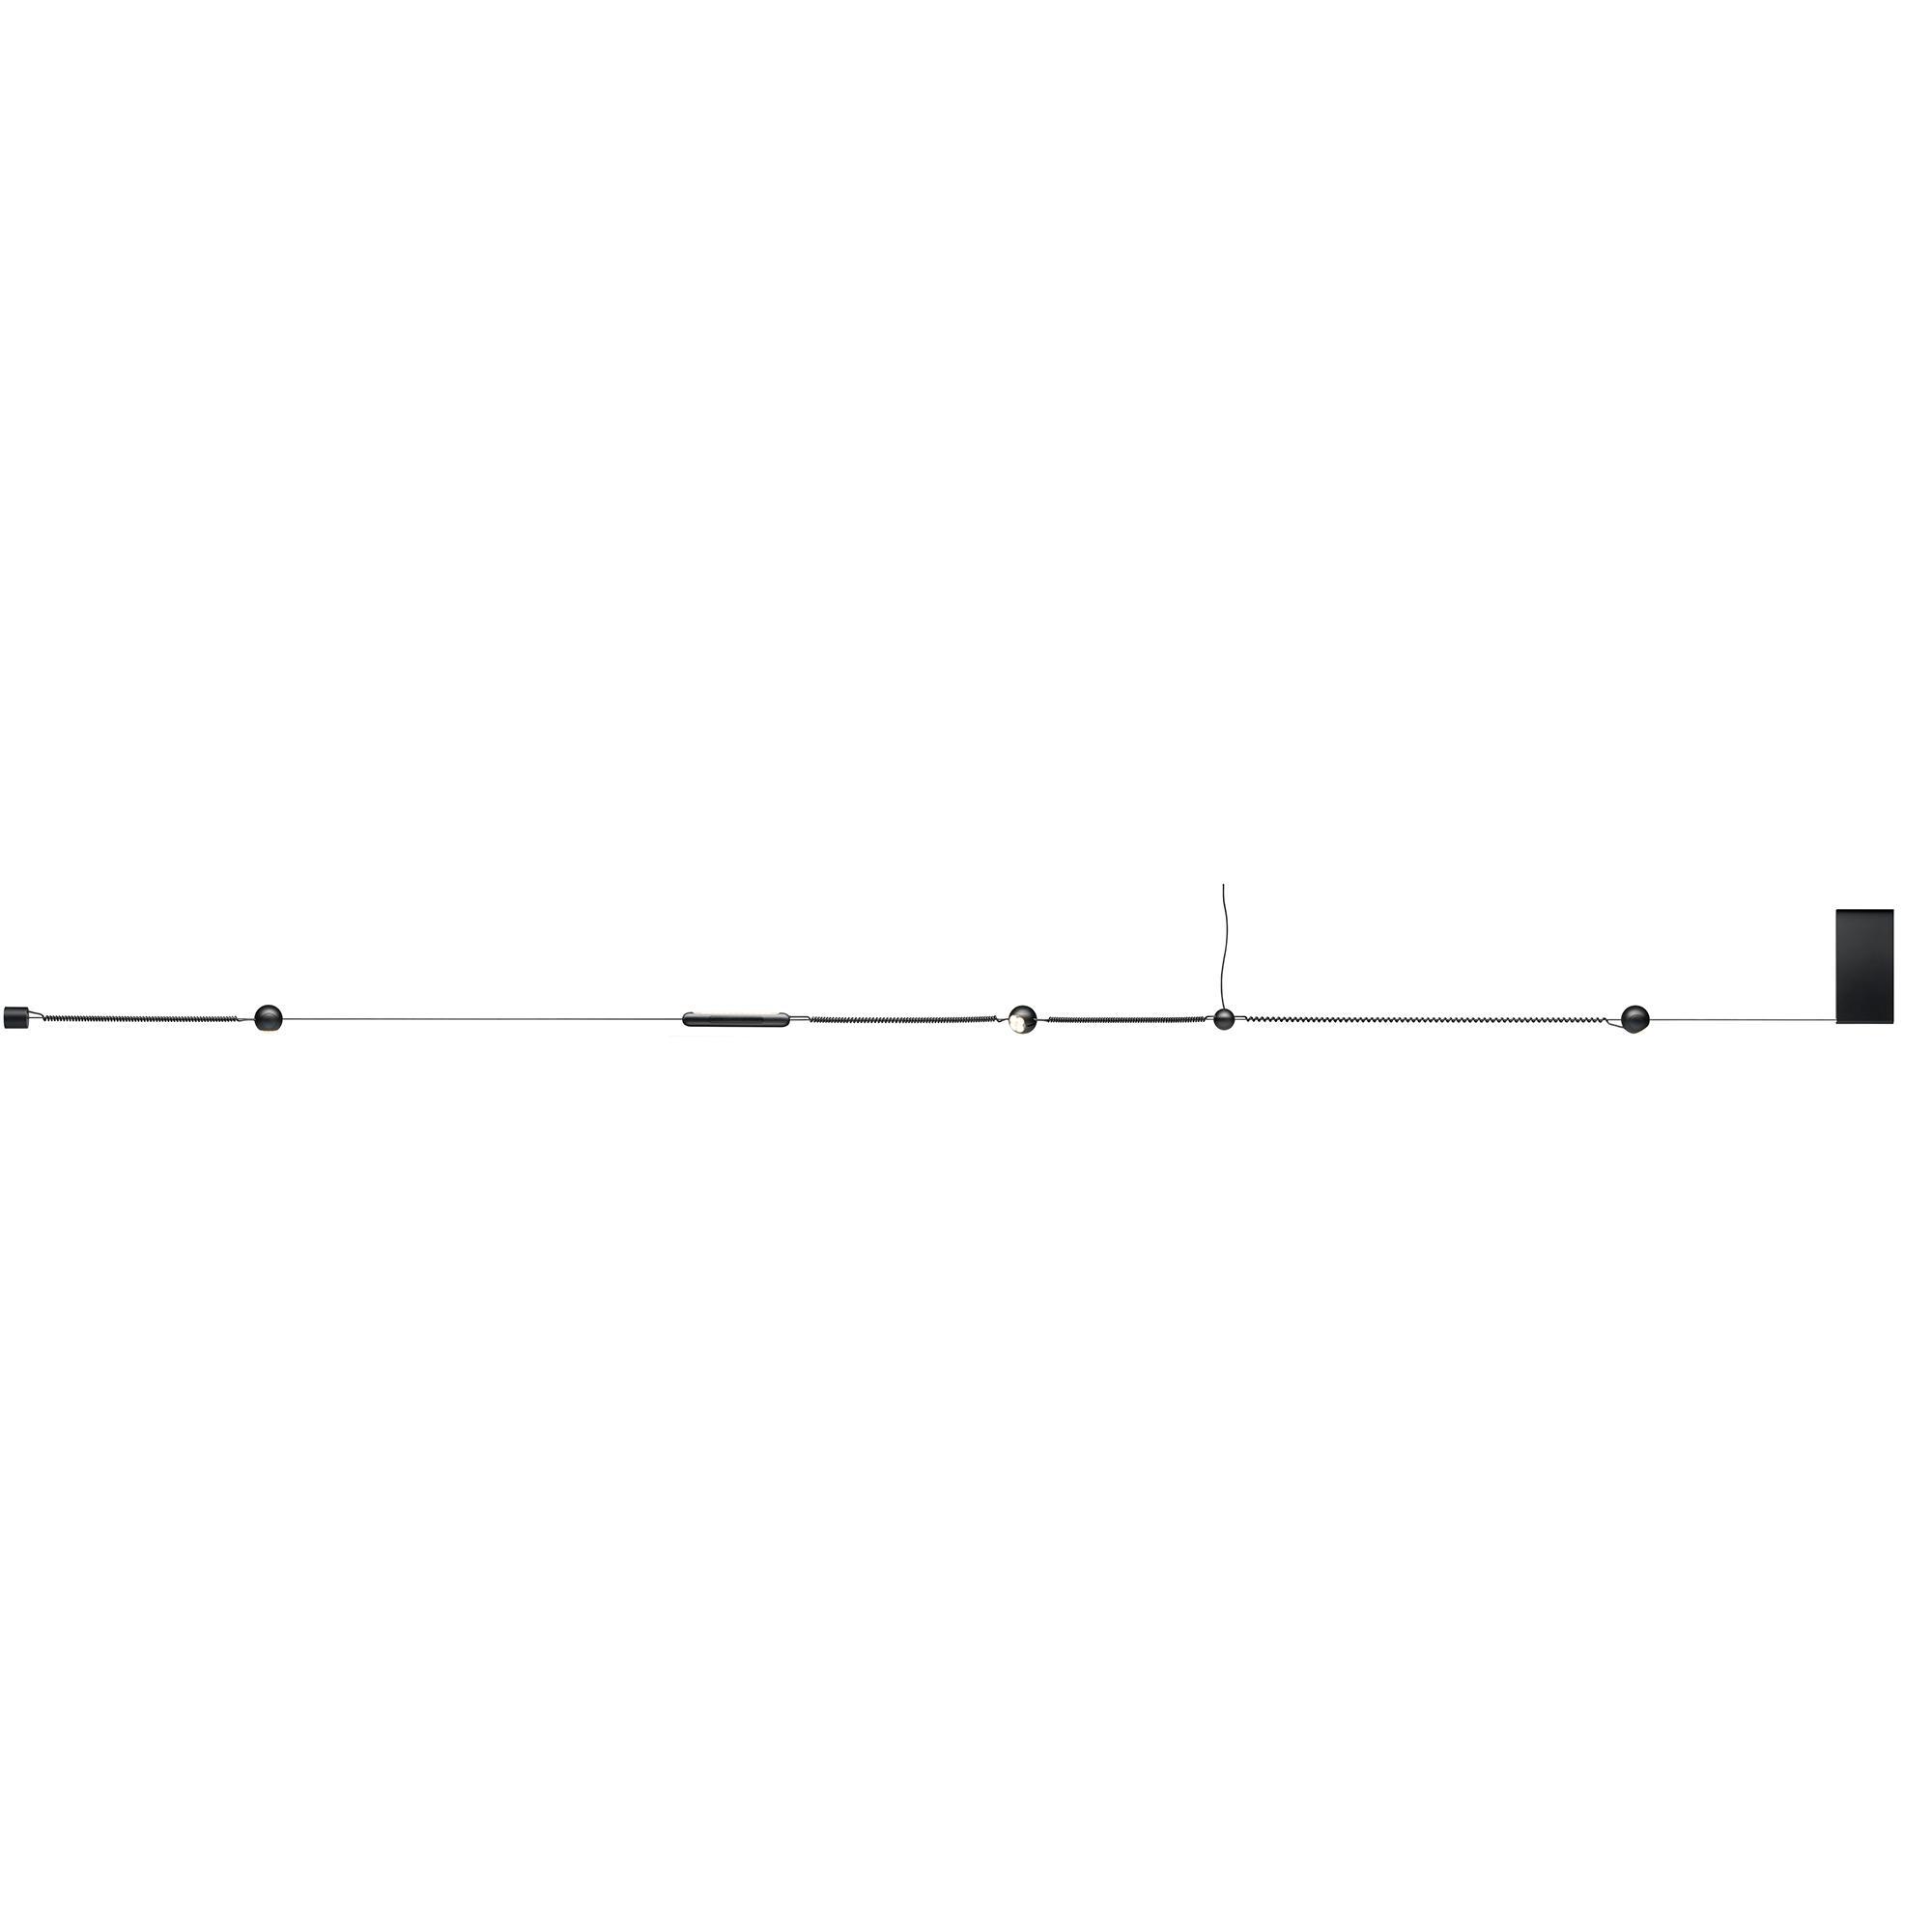 Belux - Hello LED Seilsystem Starterset - schwarz/60-200cm x Ø3.5cm  Spot Ø6cm/2700K/1120lm CRI>90   Lampen > Strahler und Systeme > Seilsysteme   Schwarz   Pmma  aluminium   Belux